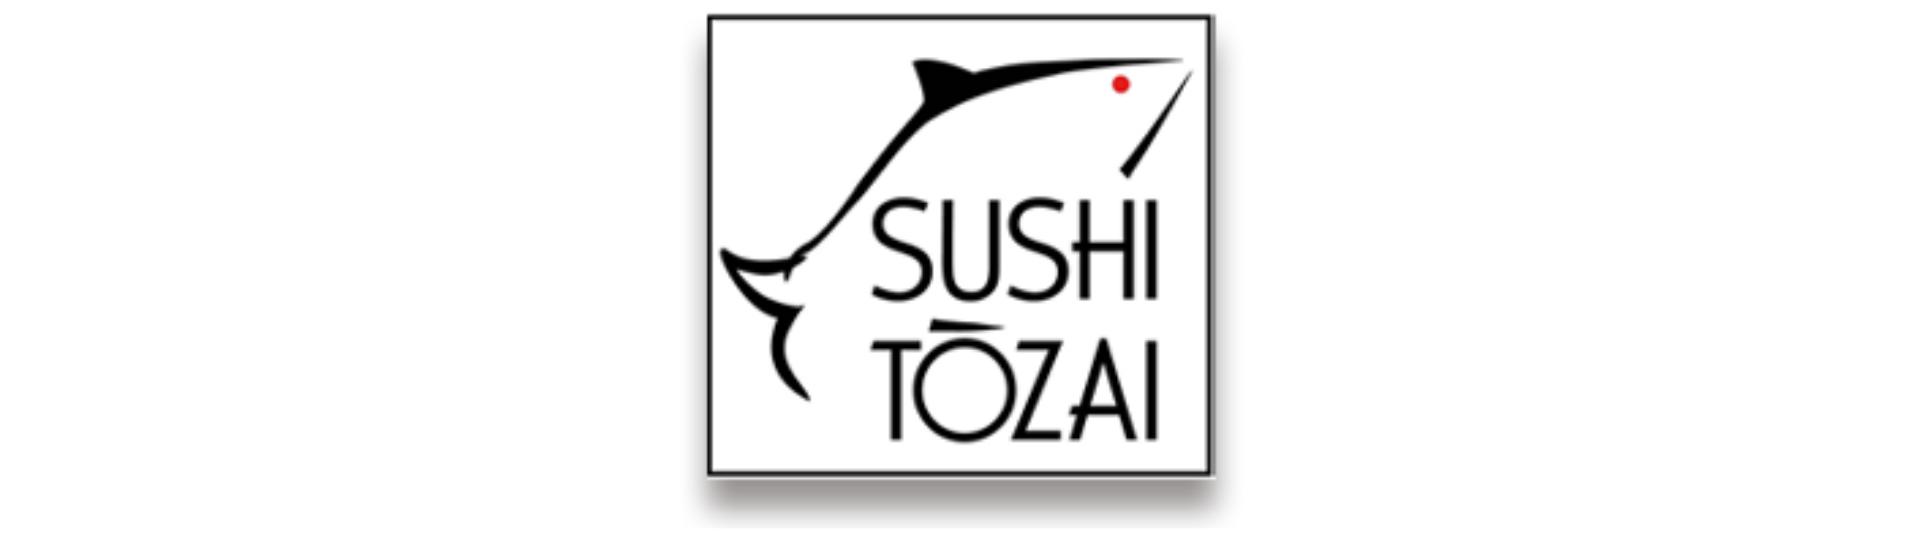 sushi tozai banner